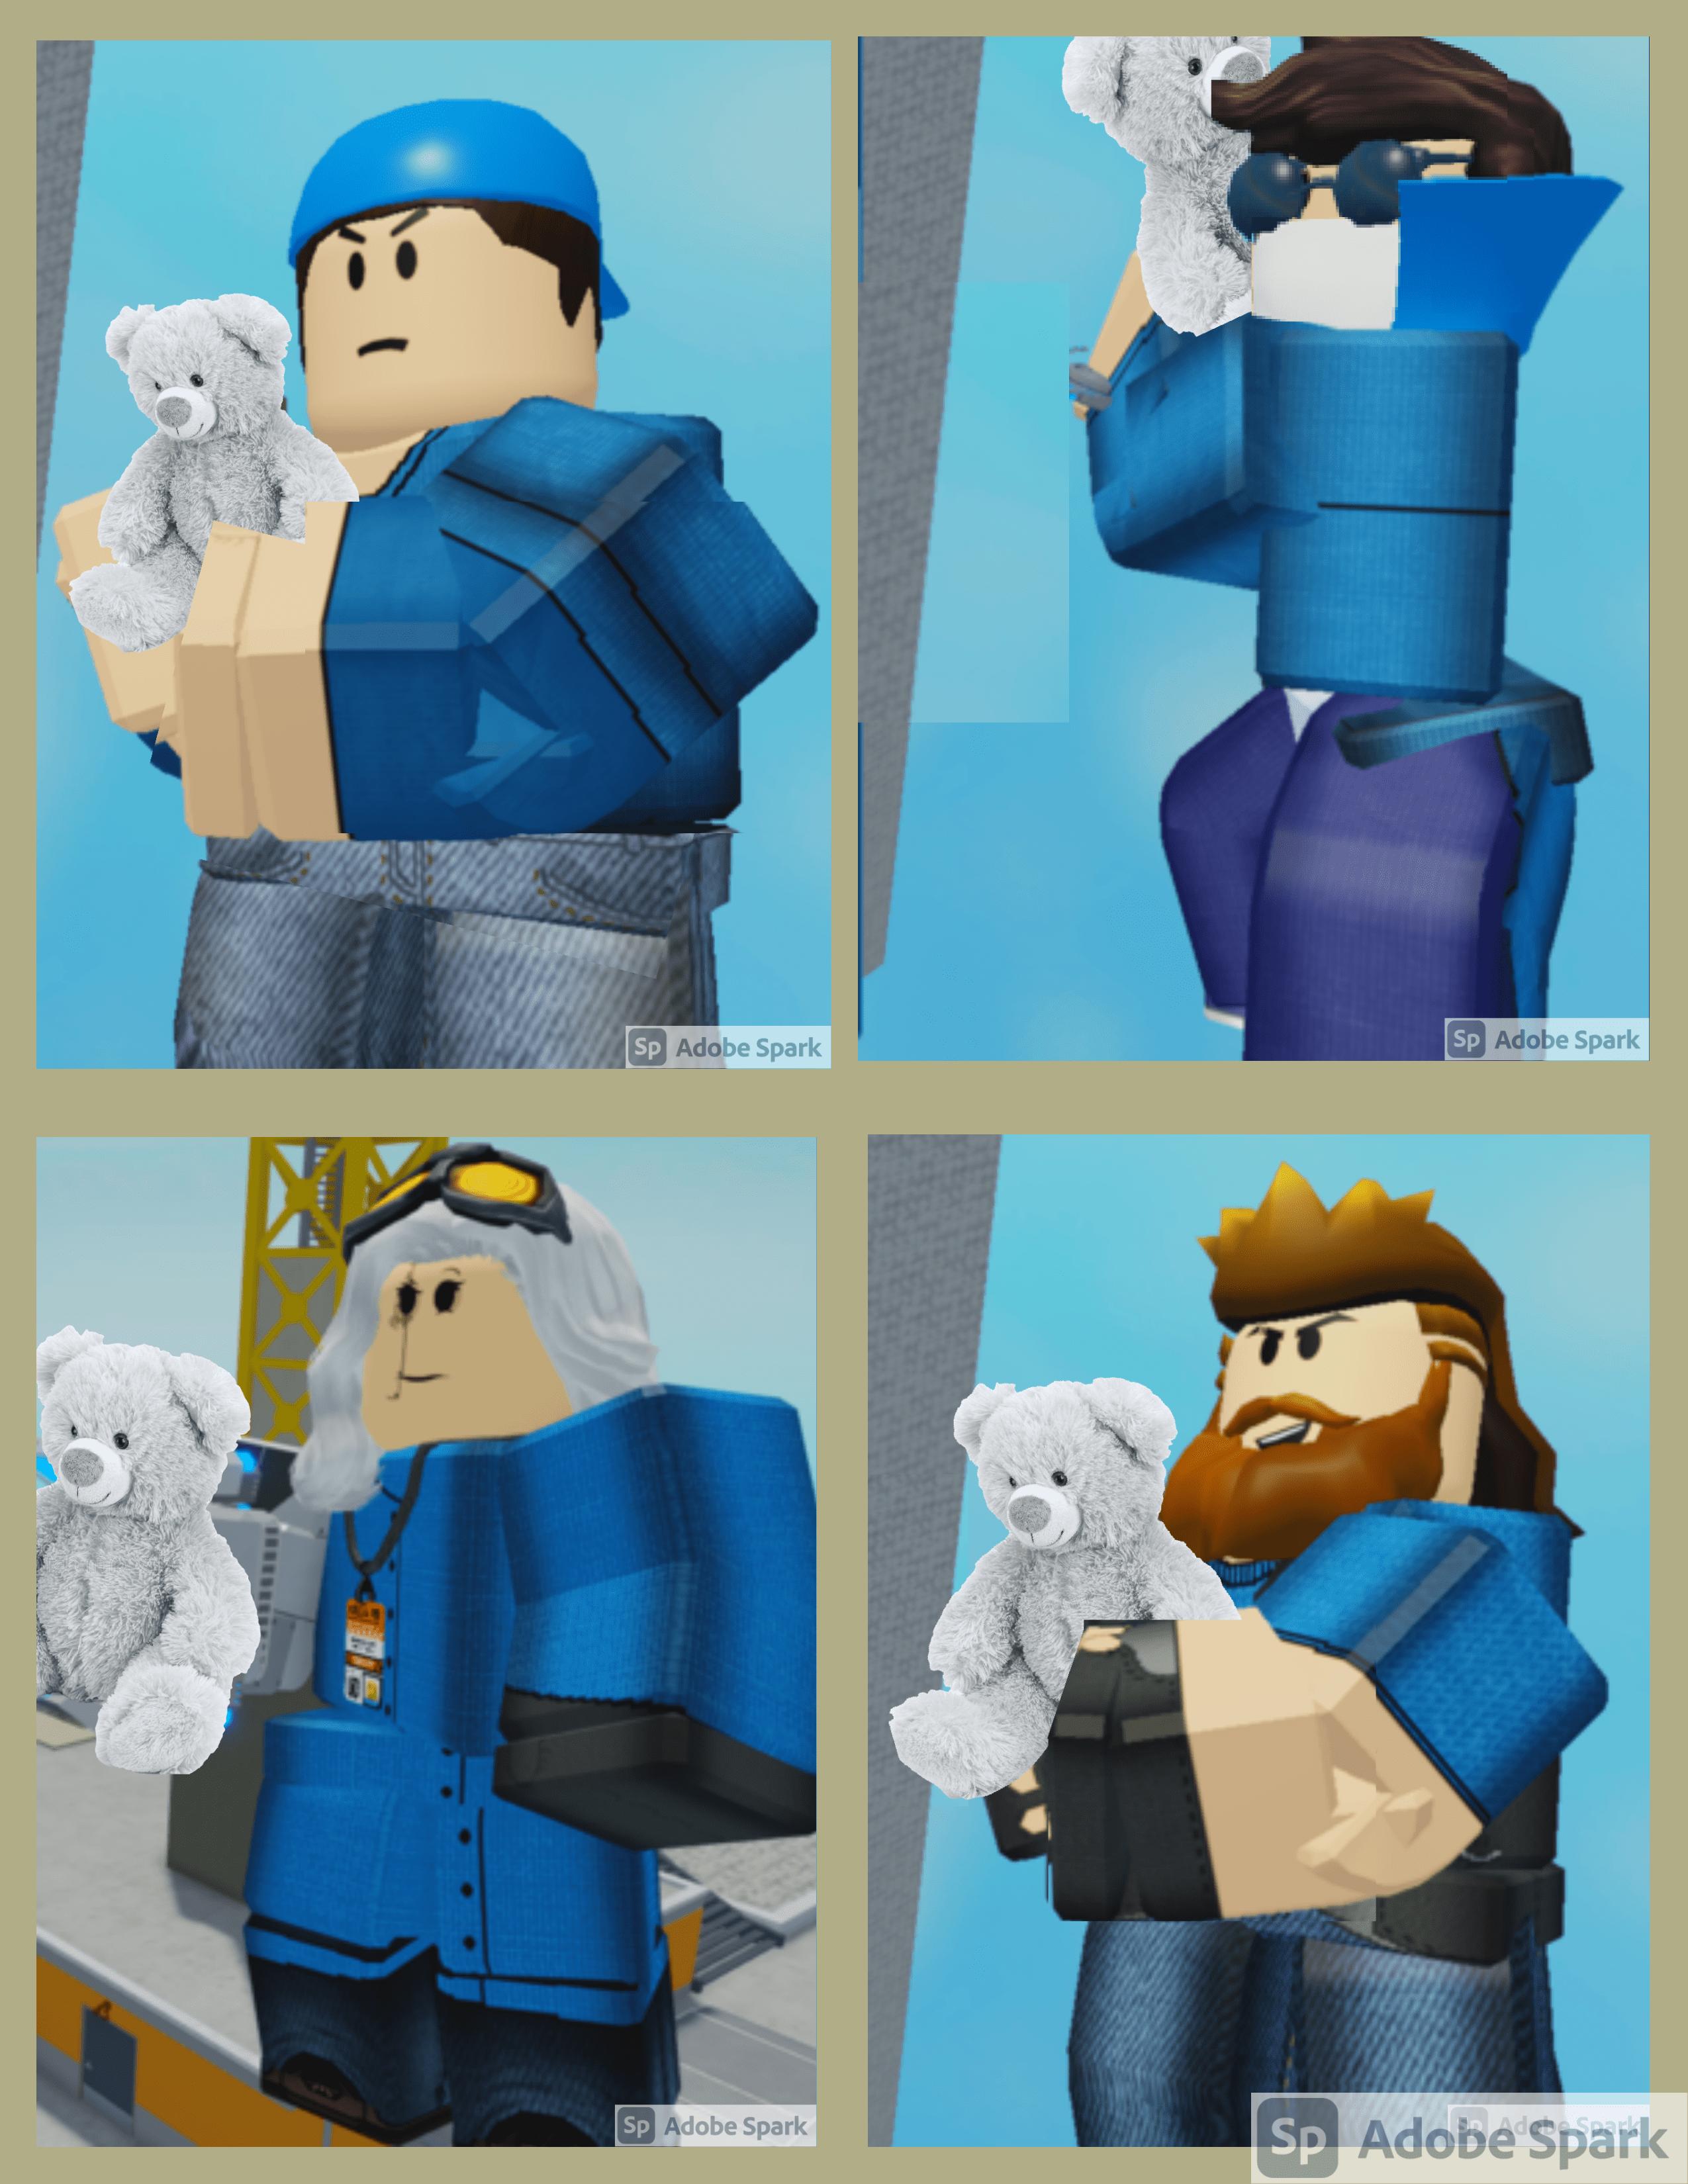 arsenal skins holding teddy bears lol